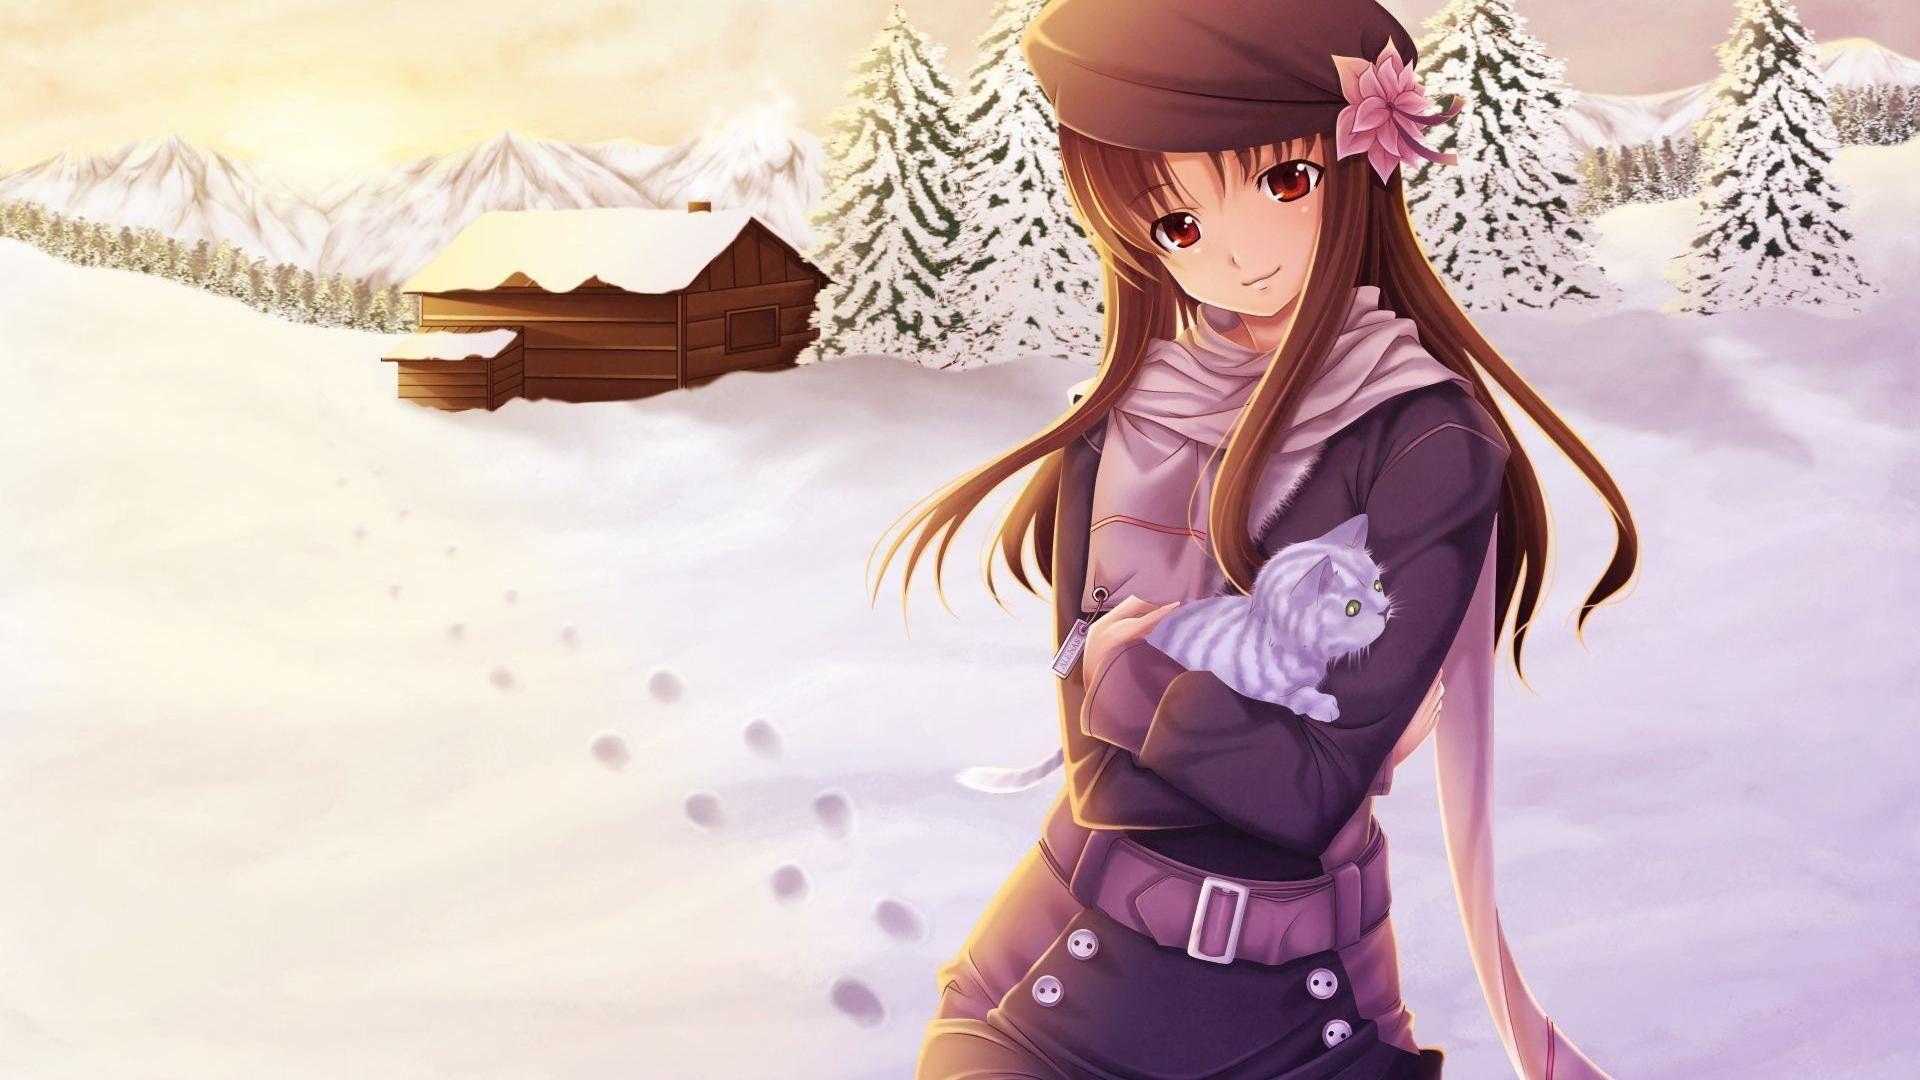 Cute Anime Girl Winter Cartoon Hd Wallpaper Stuff To Buy